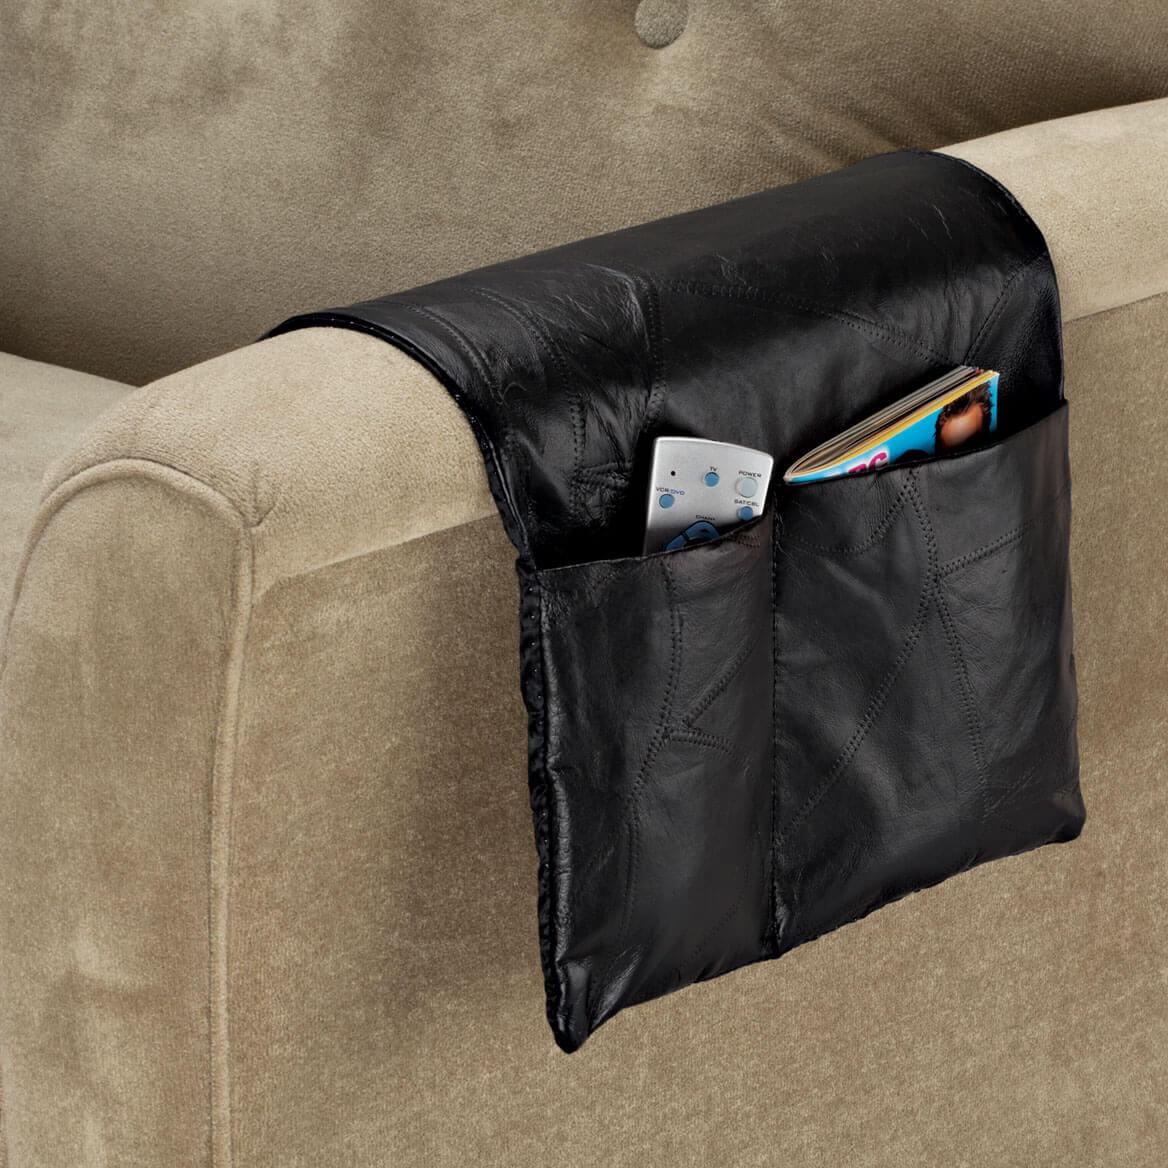 Leather Armrest Organizer-337164